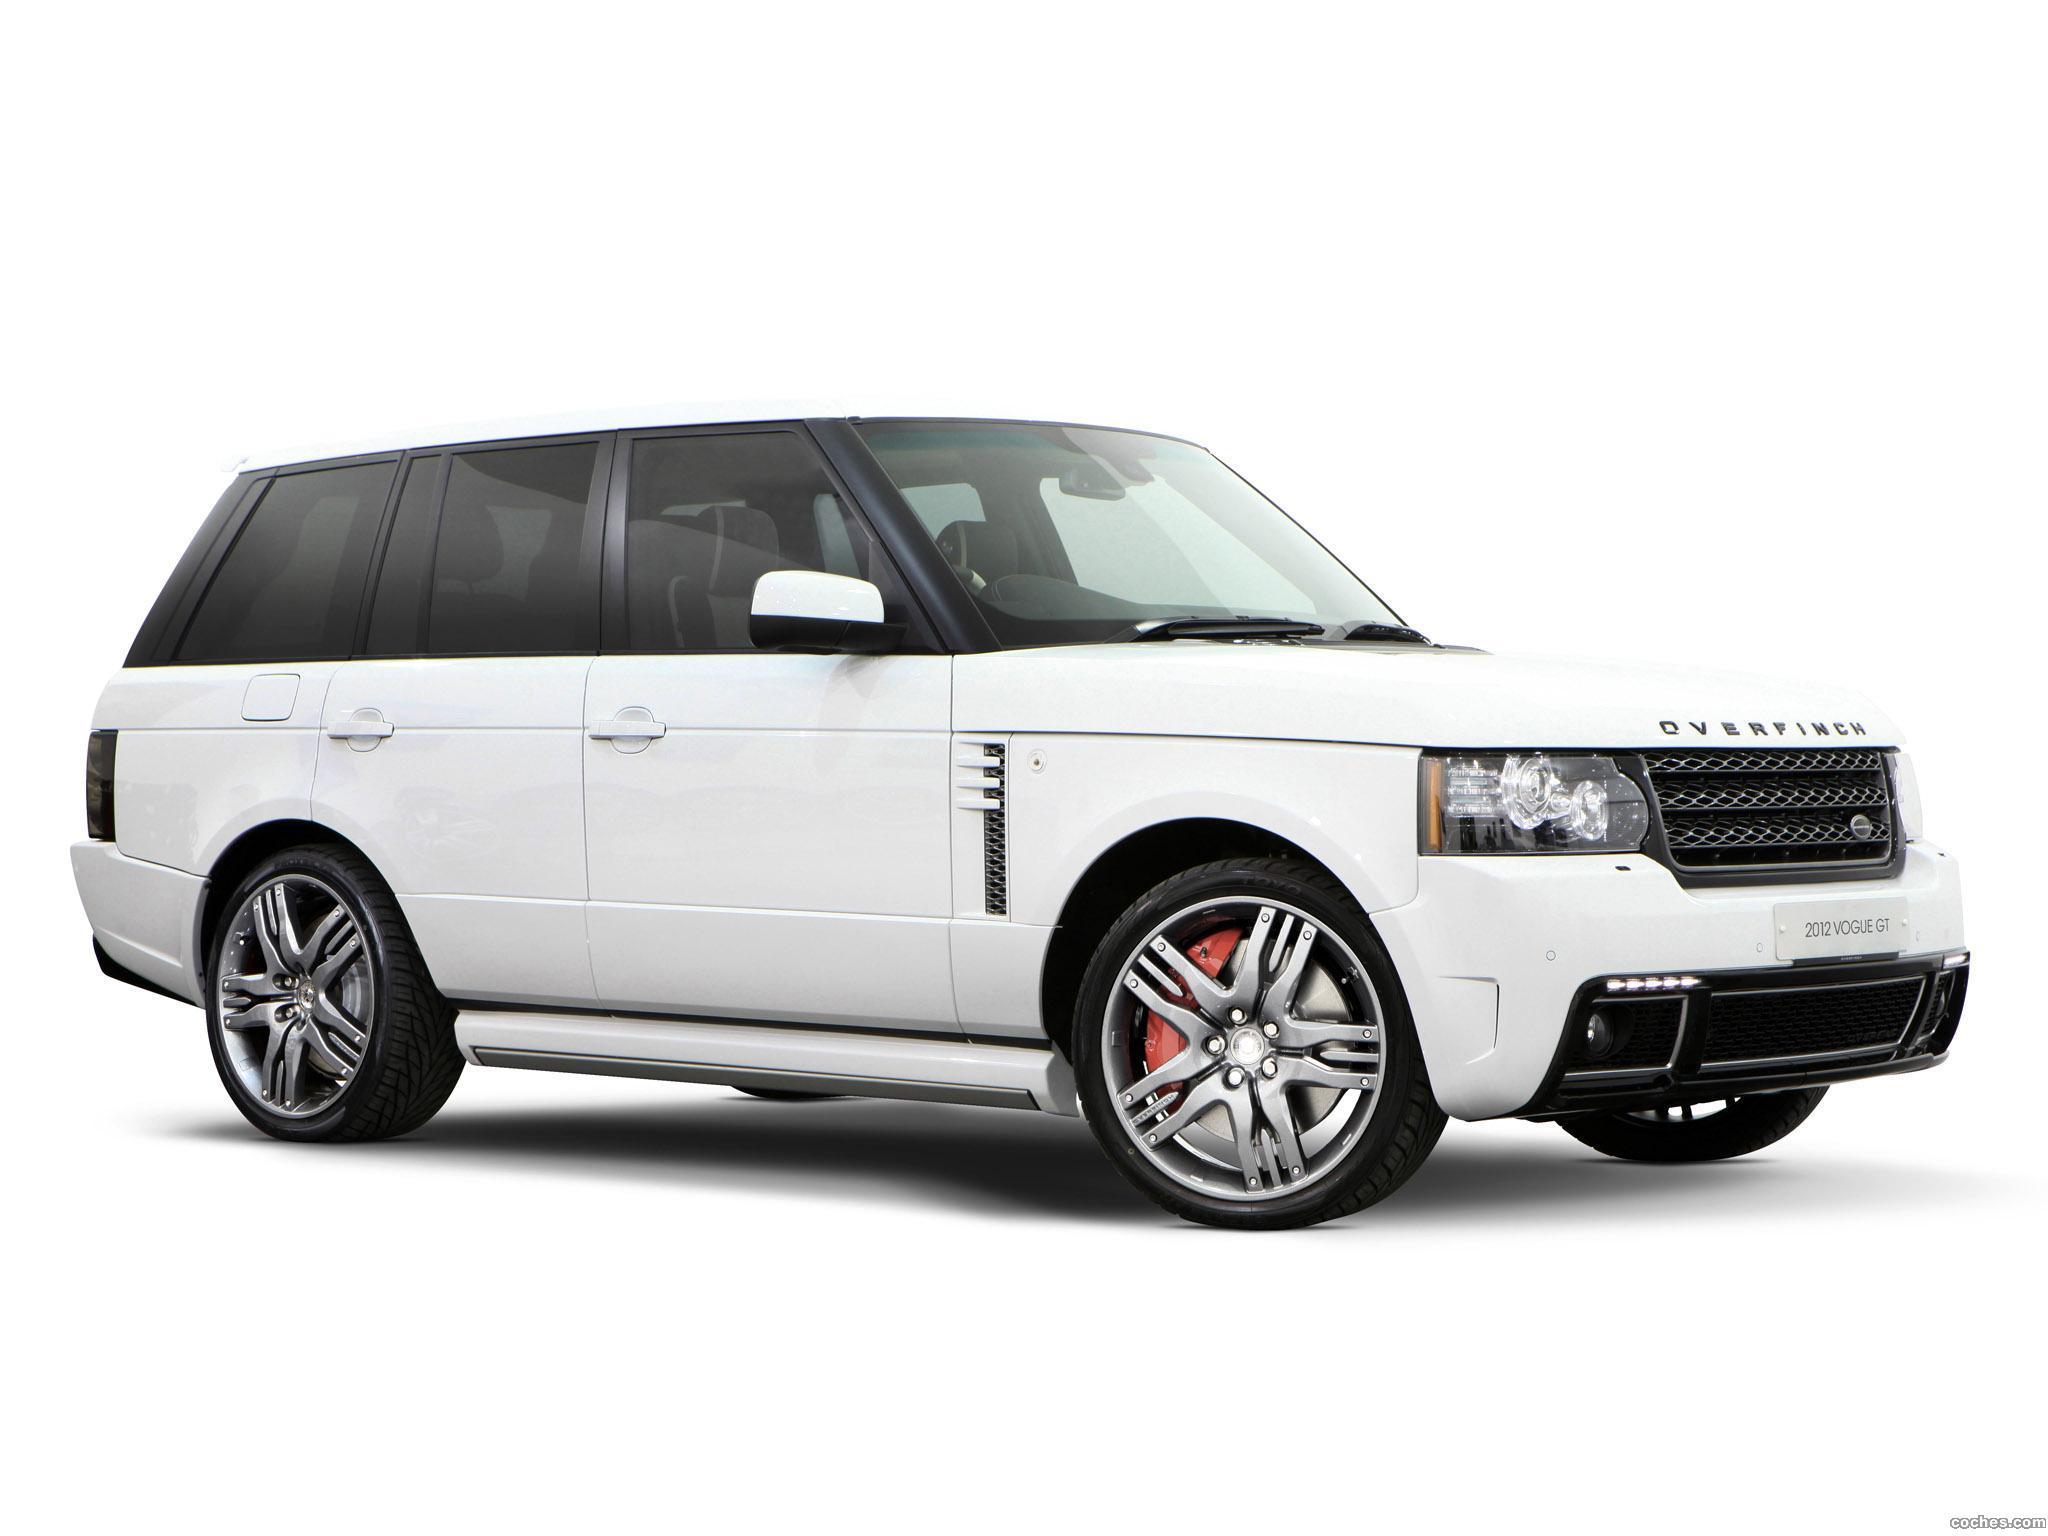 Foto 0 de Overfinch Land Rover Range Rover Vogue GT 2012